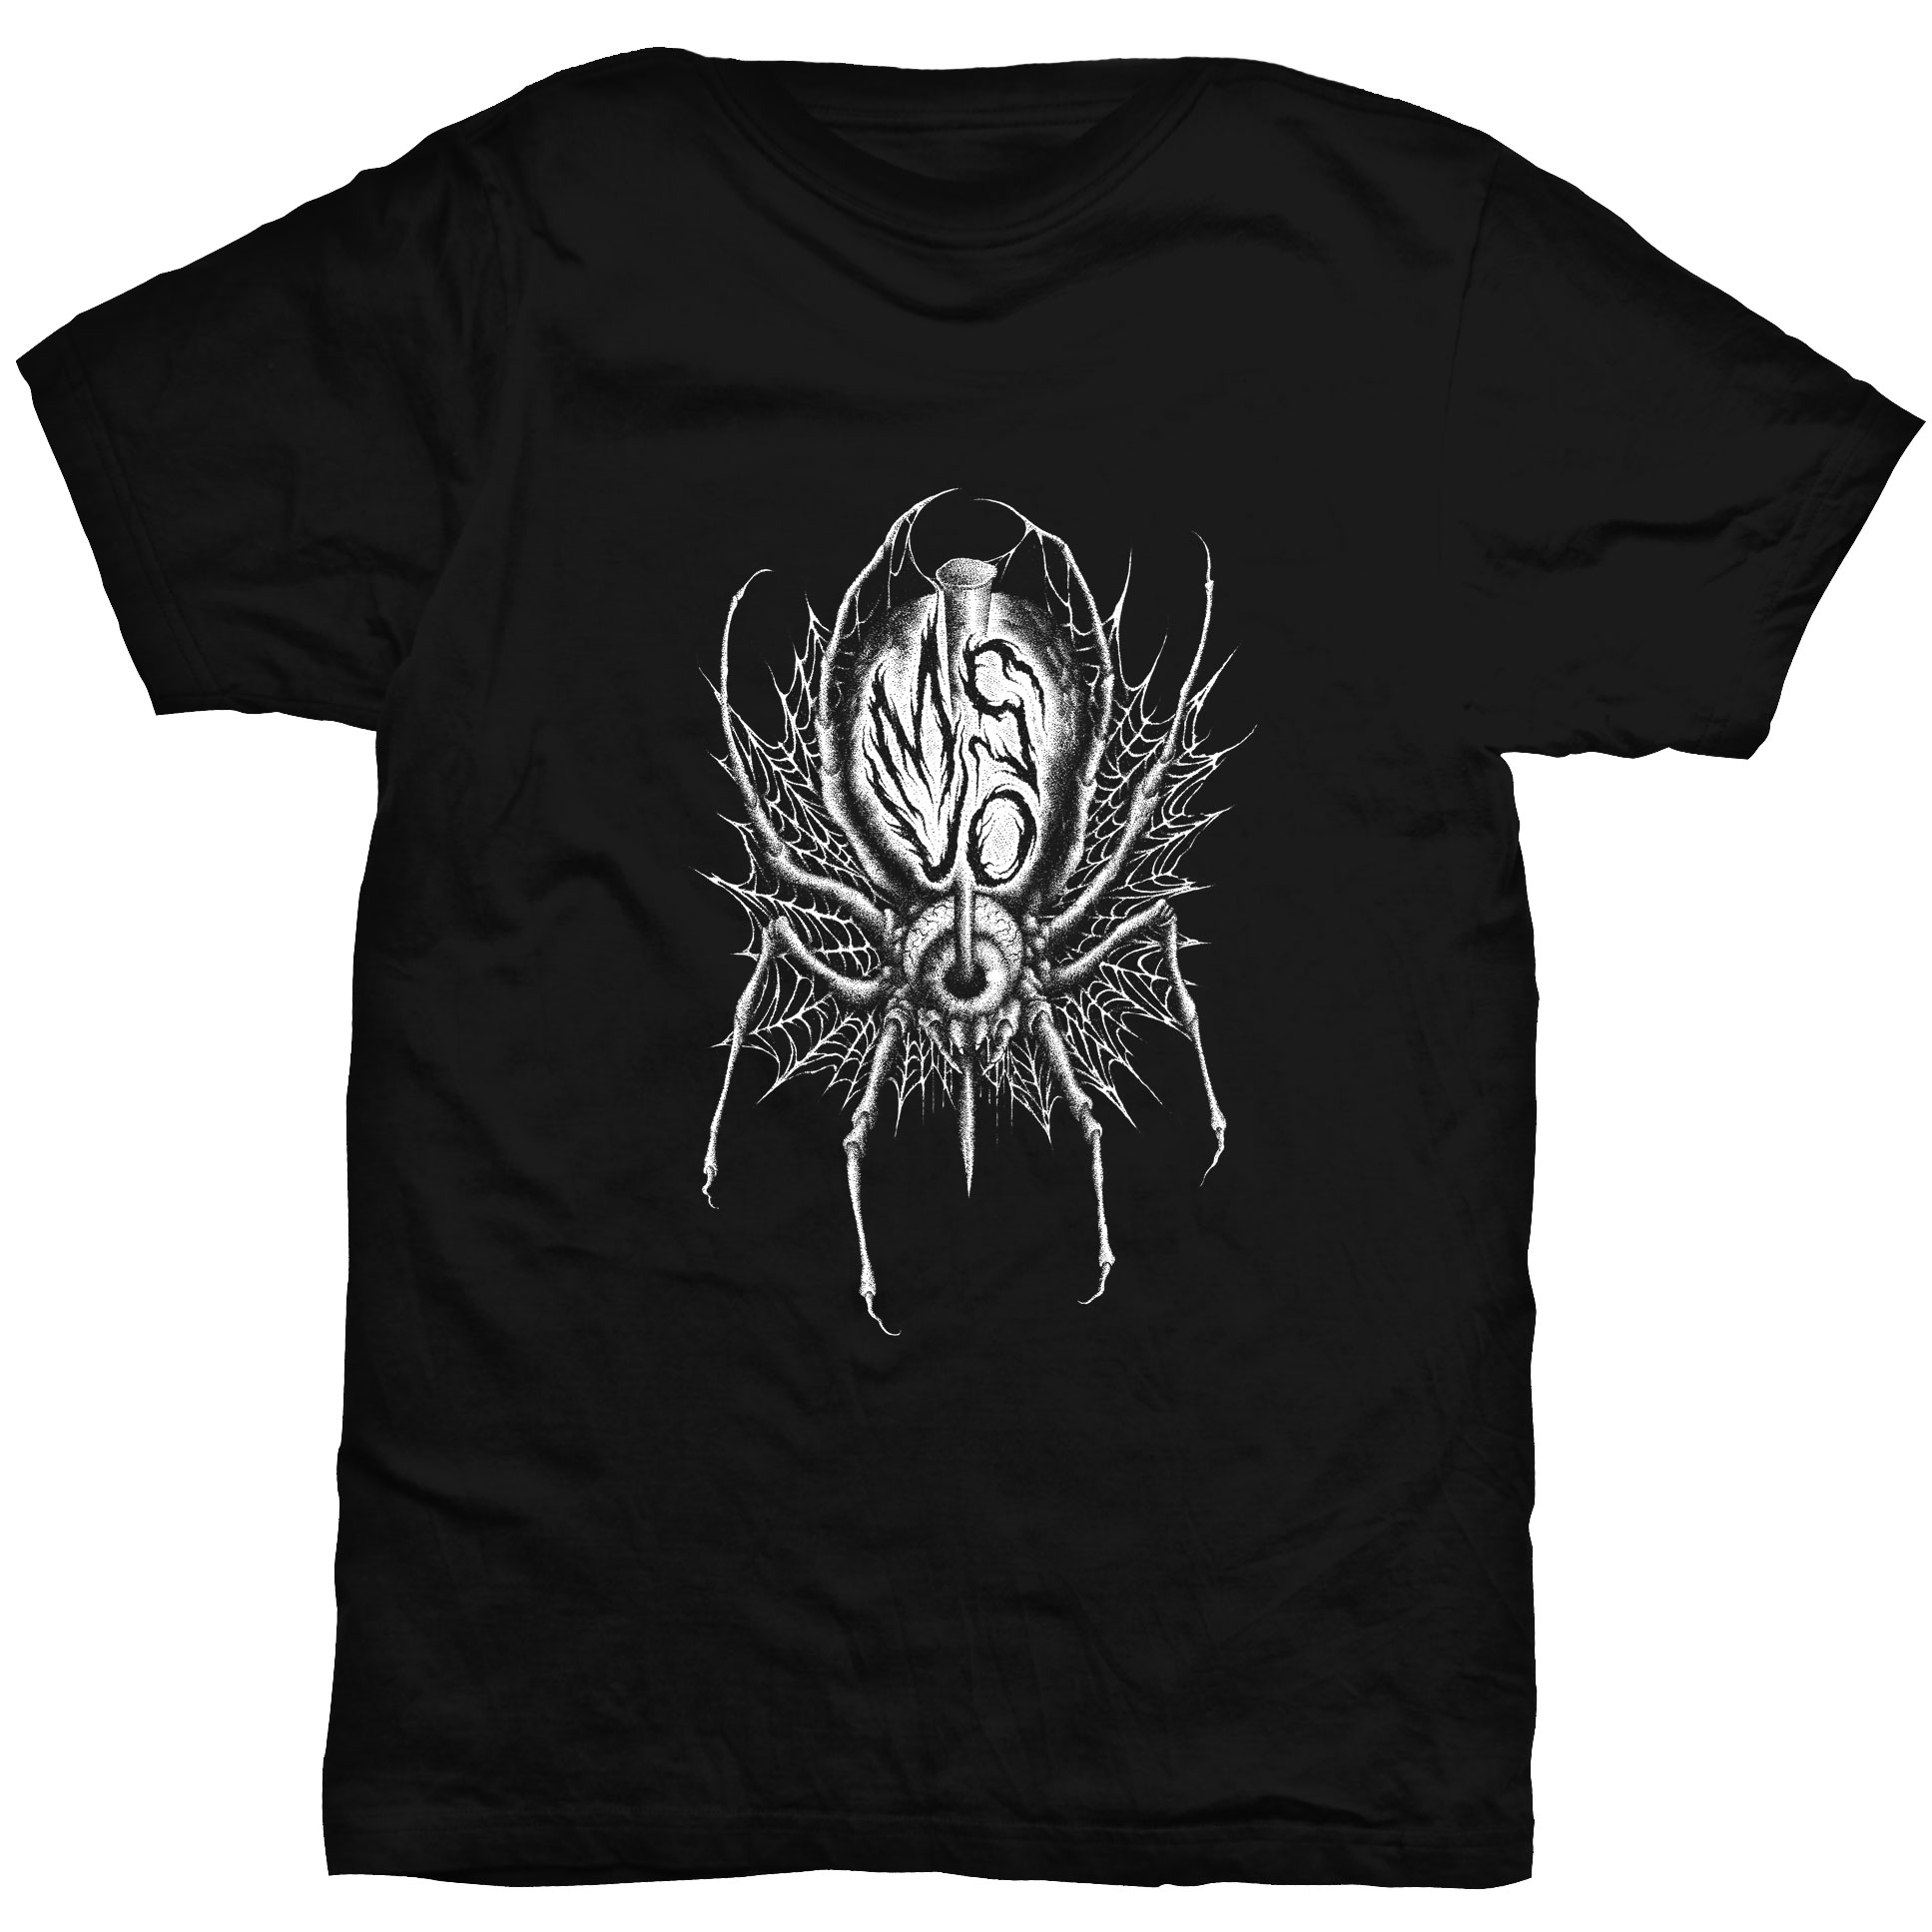 msuo spider t shirt me saco un ojo records